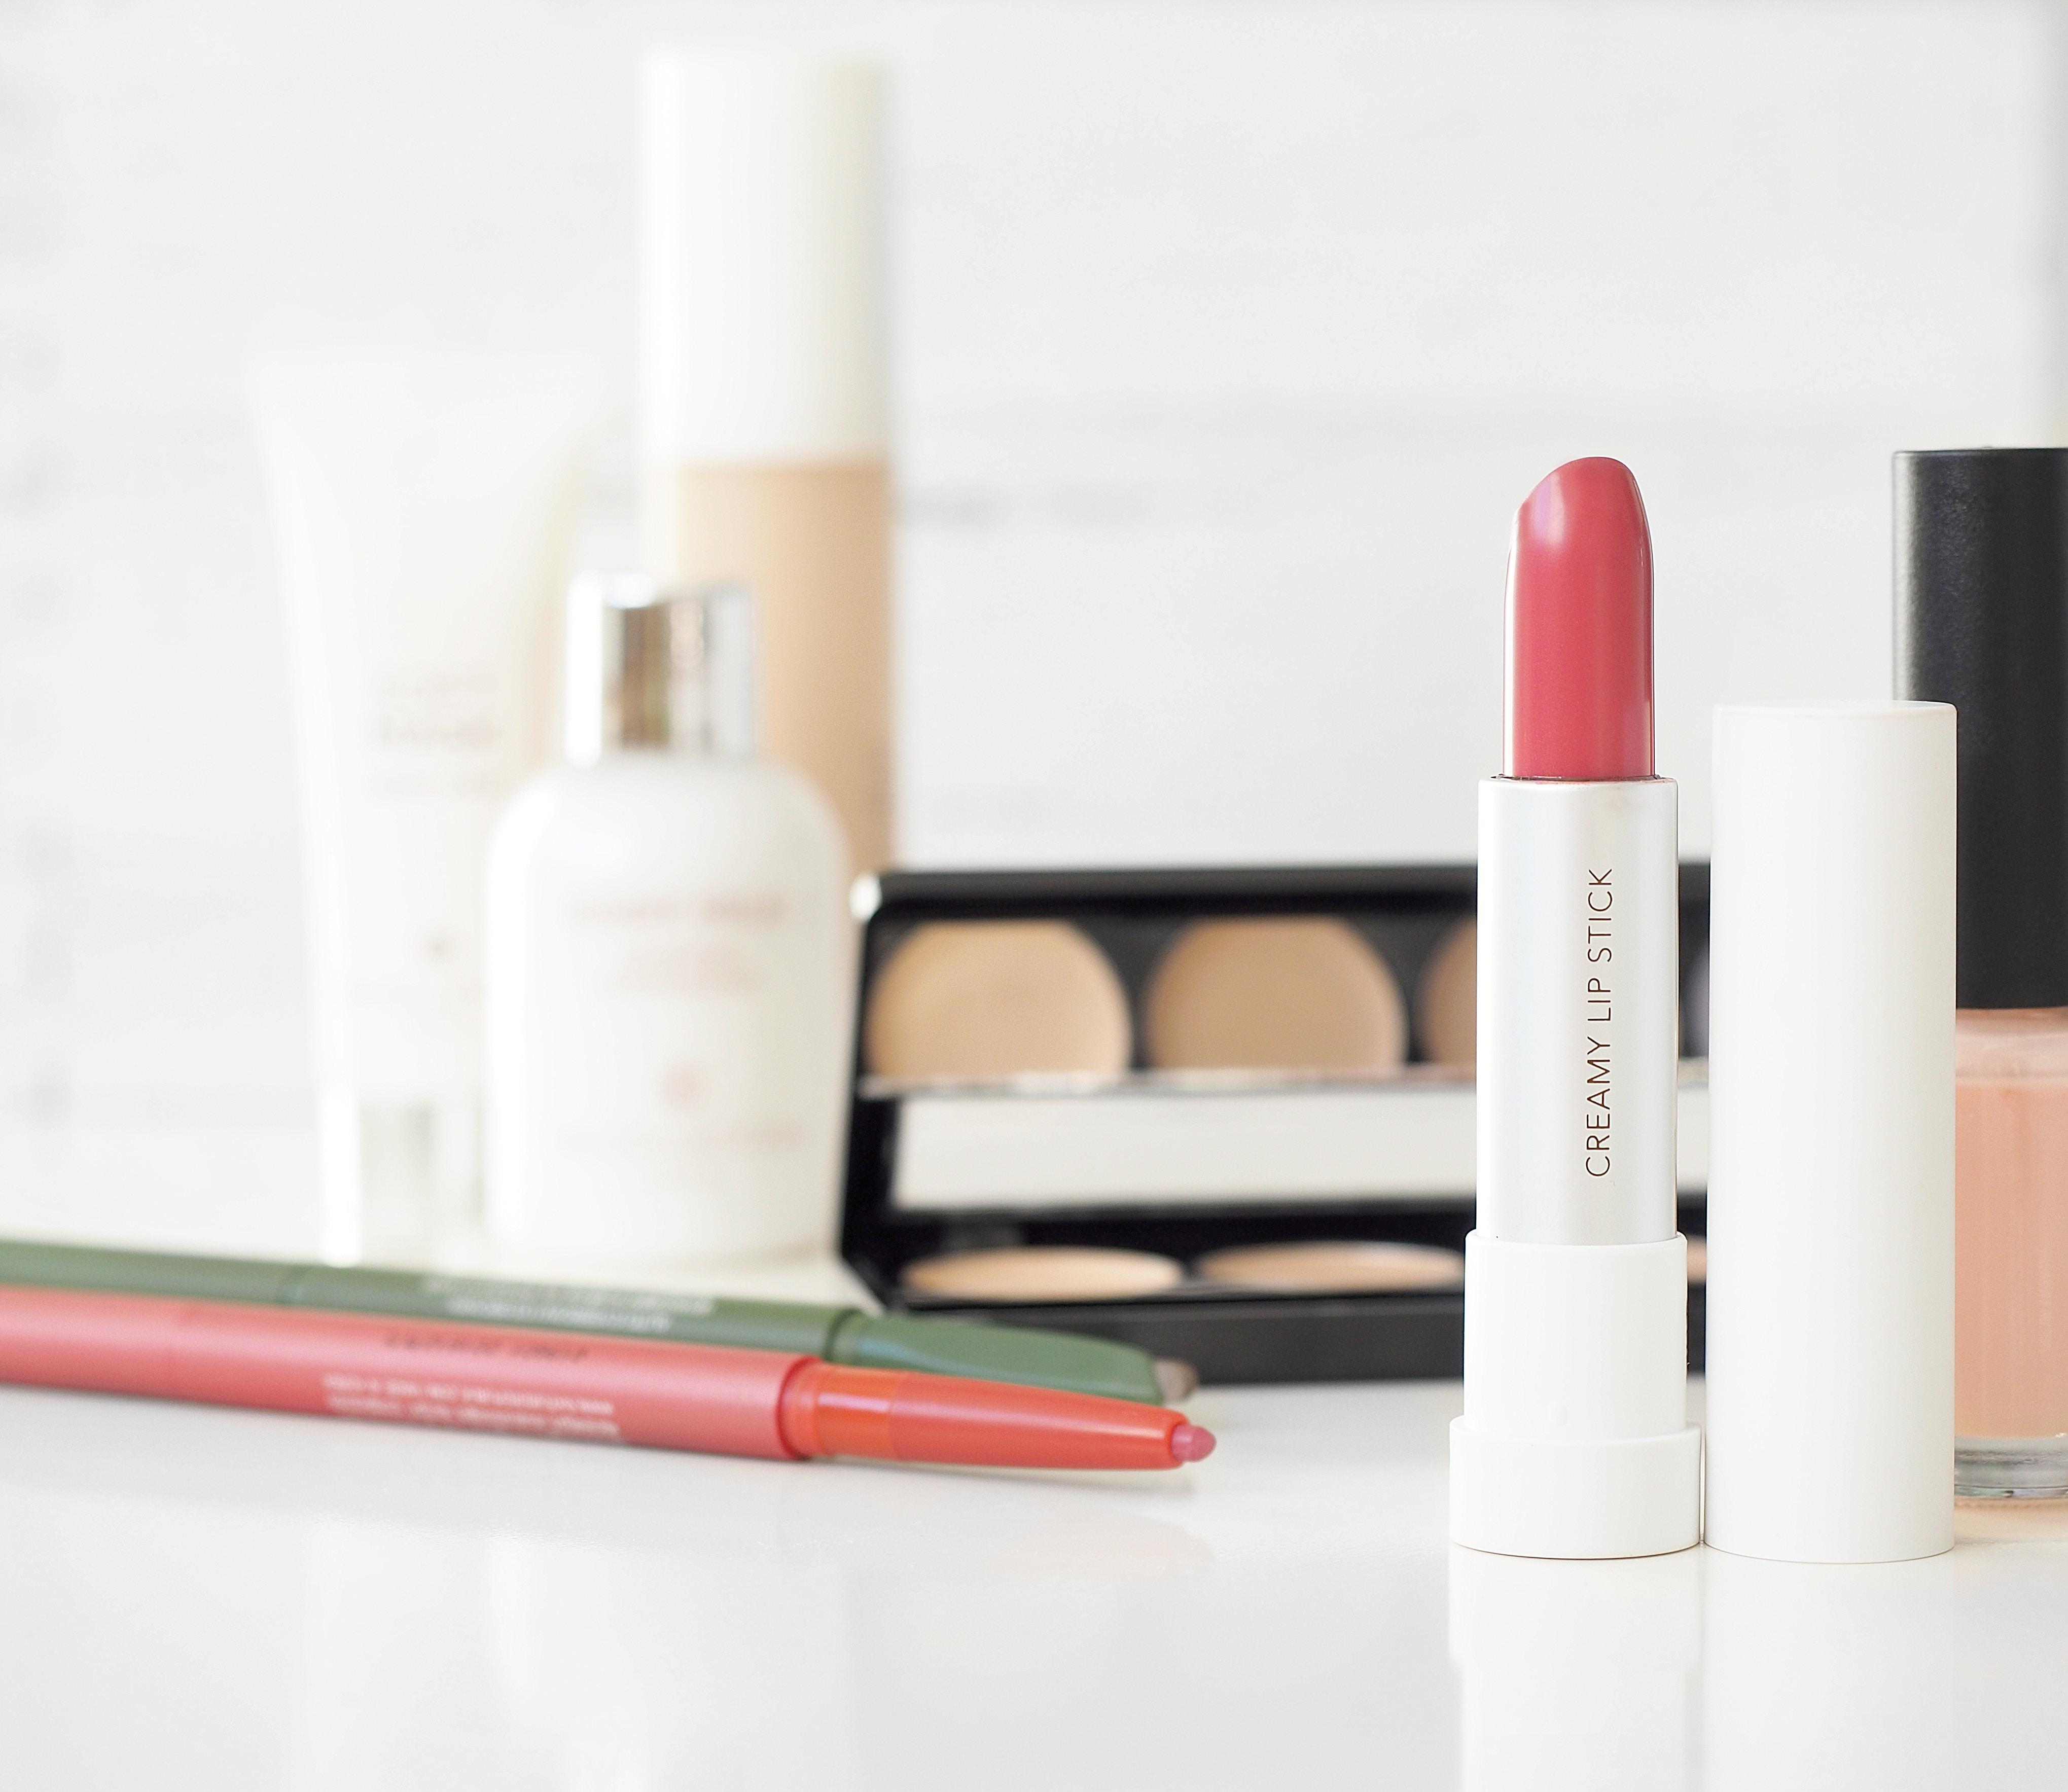 De mooiste lippen, de perfecte look!